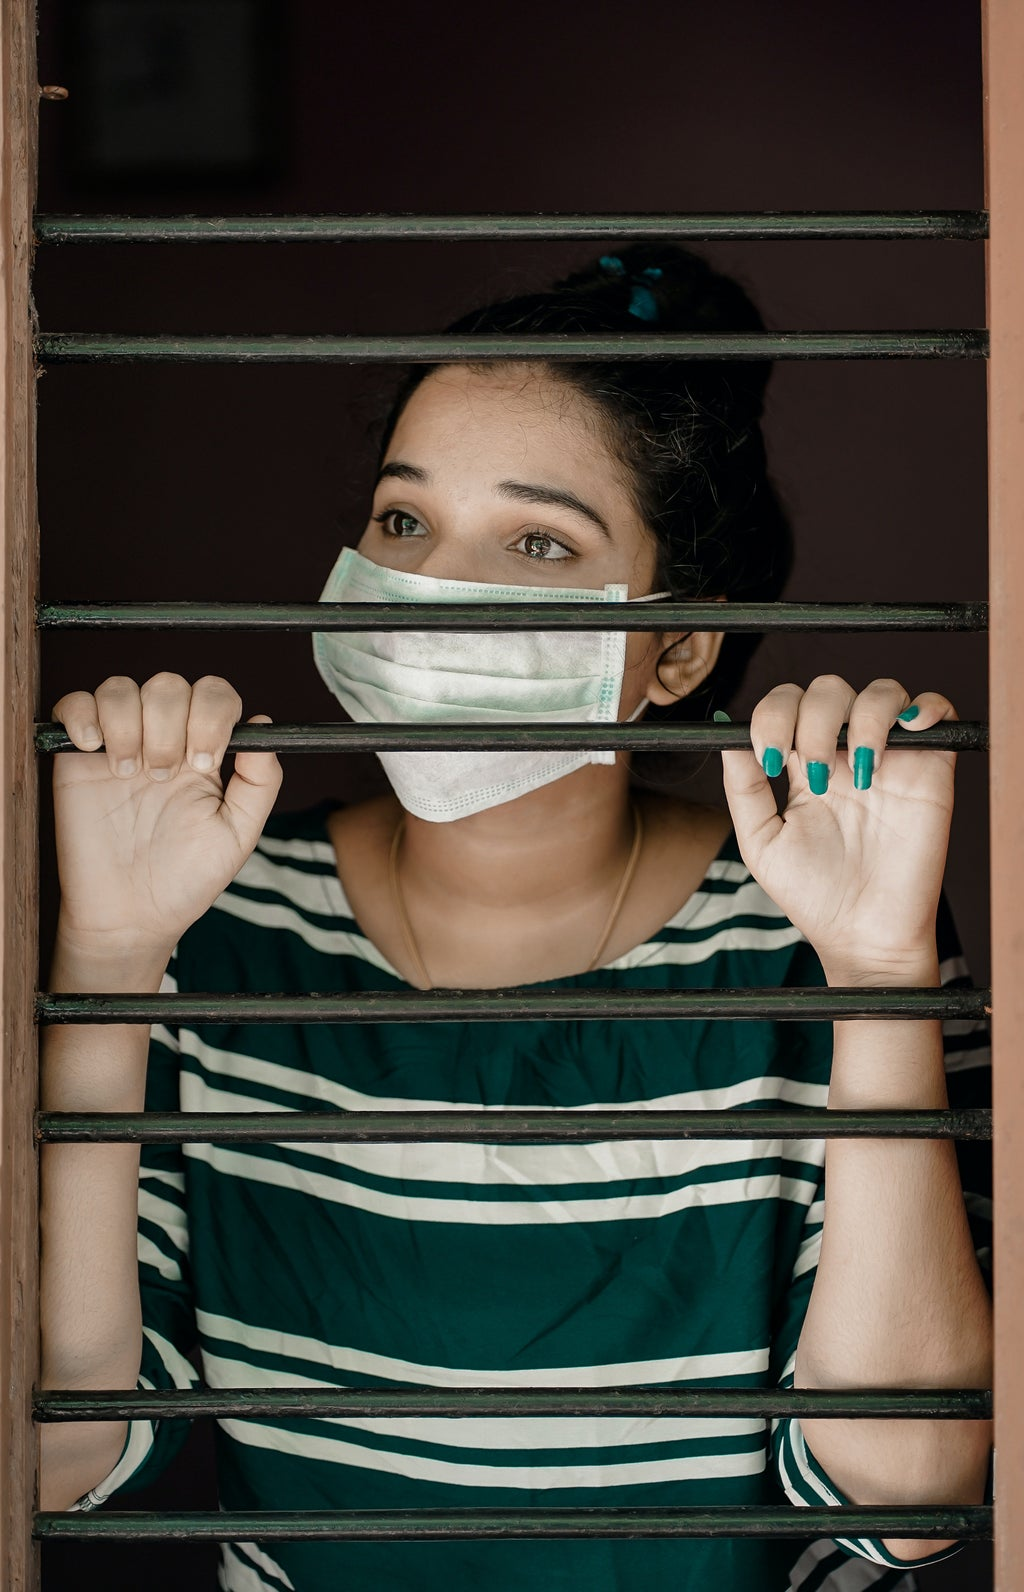 stuck indoors wearing mask by Pexels